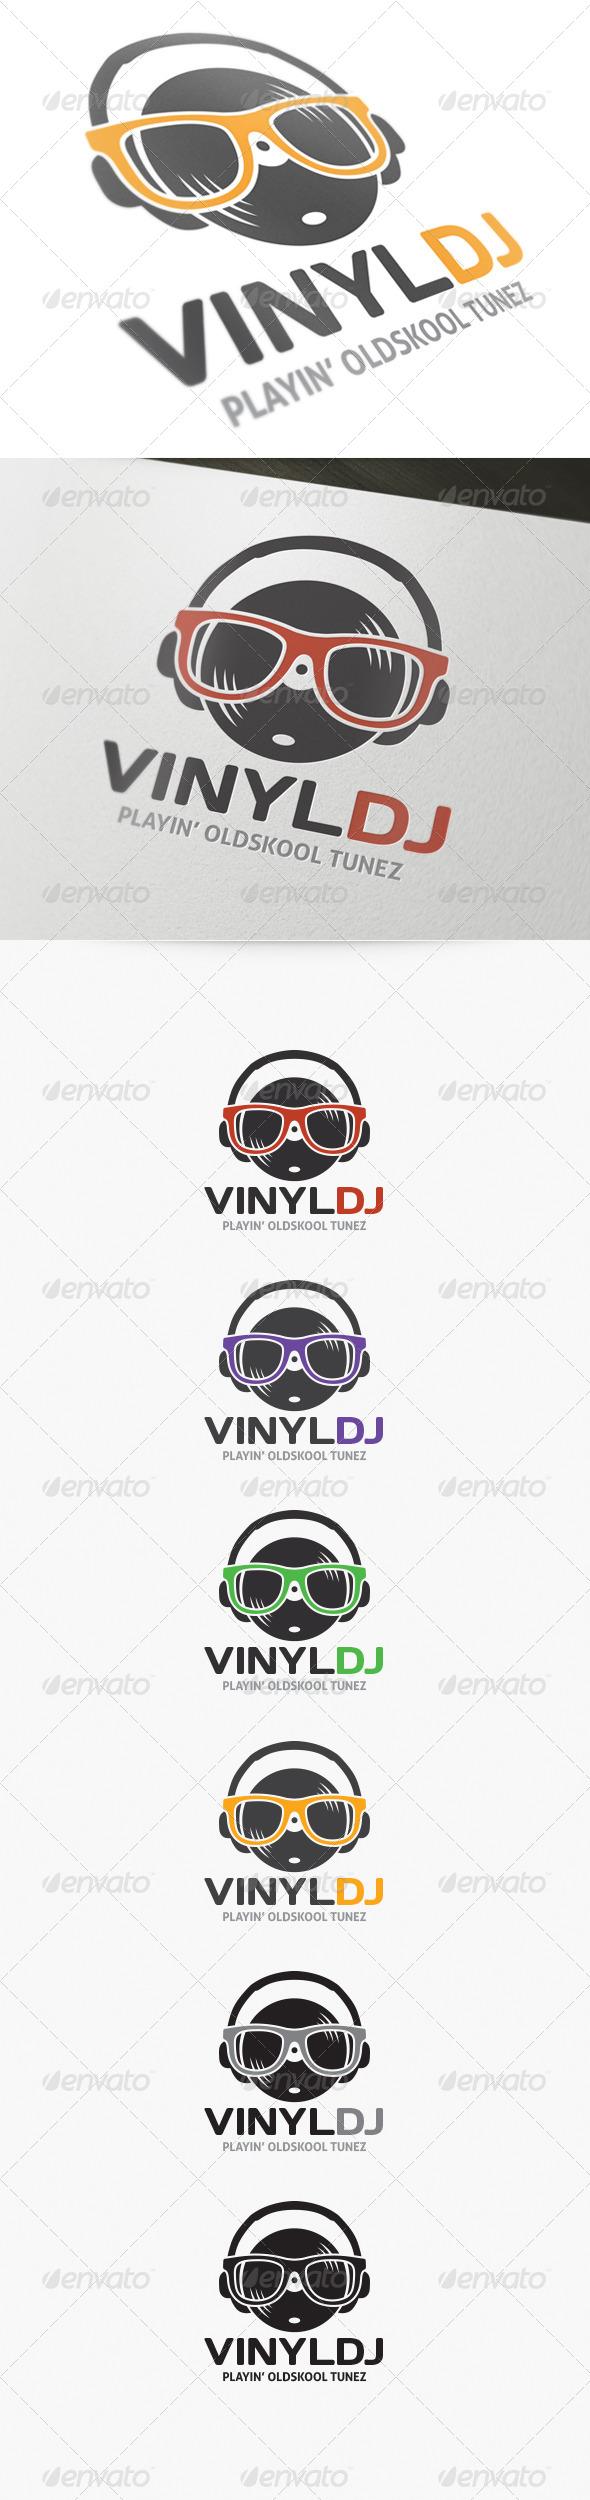 Vinyl DJ Logo   Pinterest   Dj logo, Dj and Logos